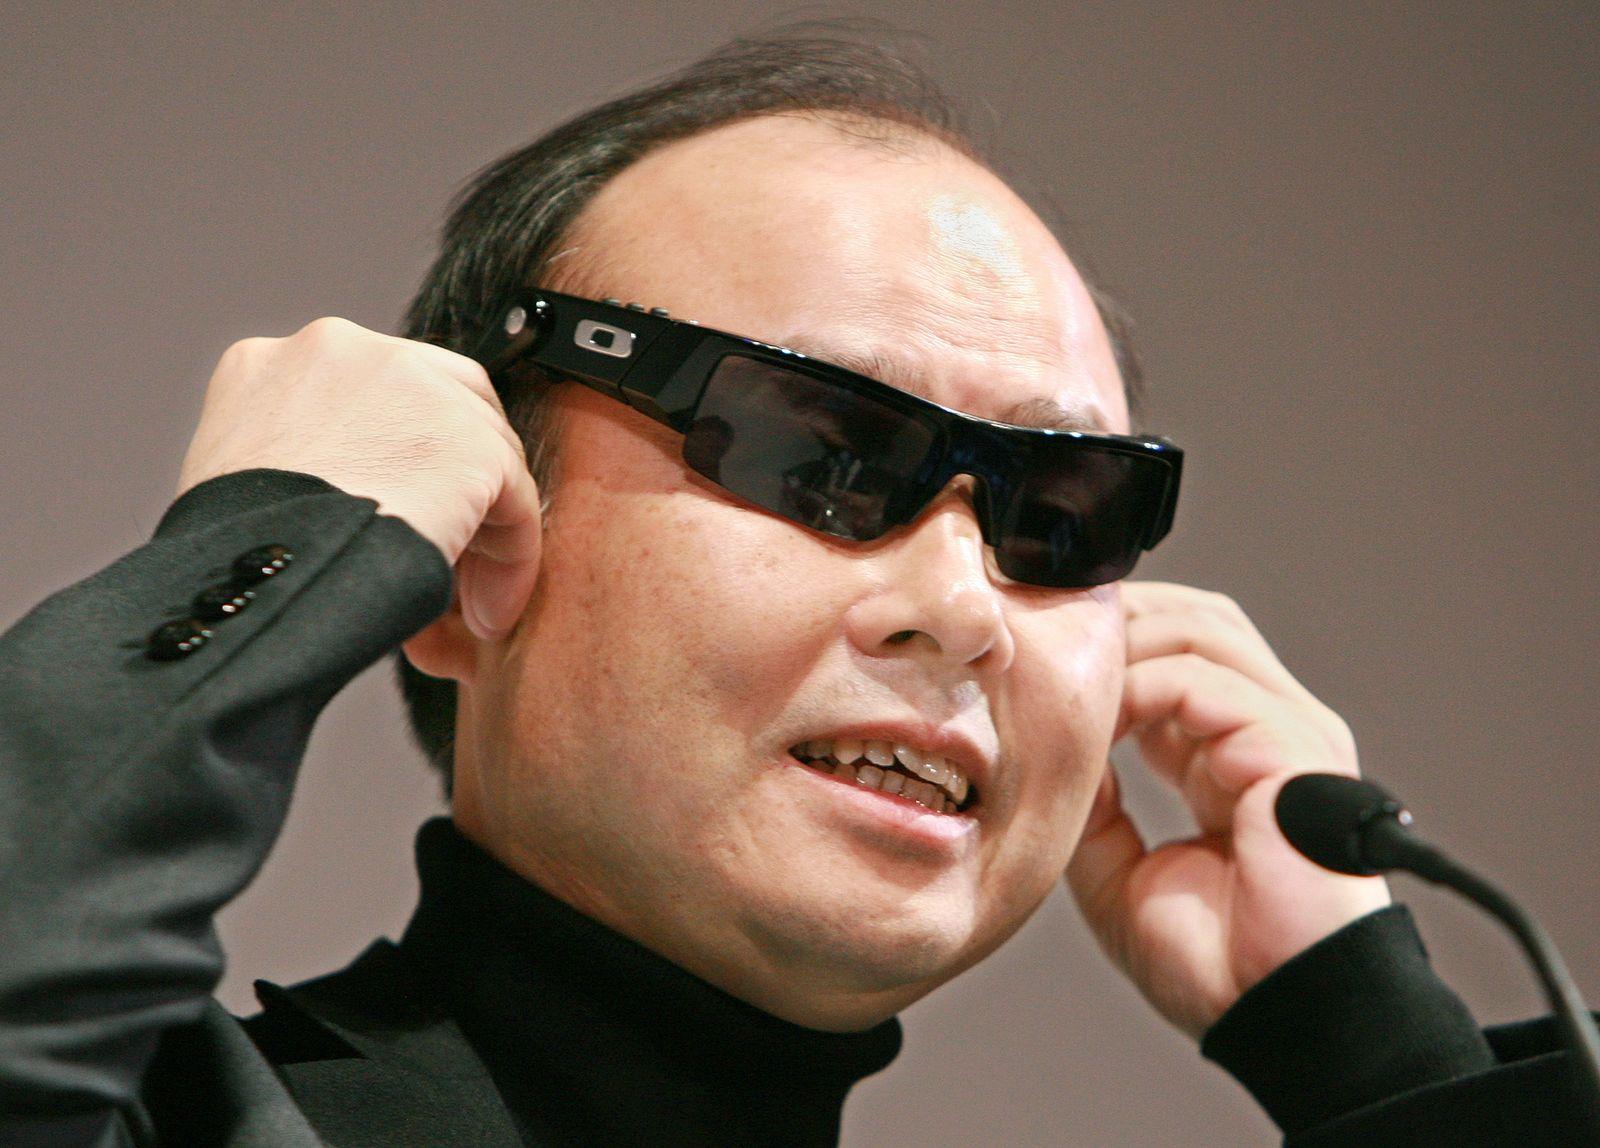 Masayoshi Son / 2007